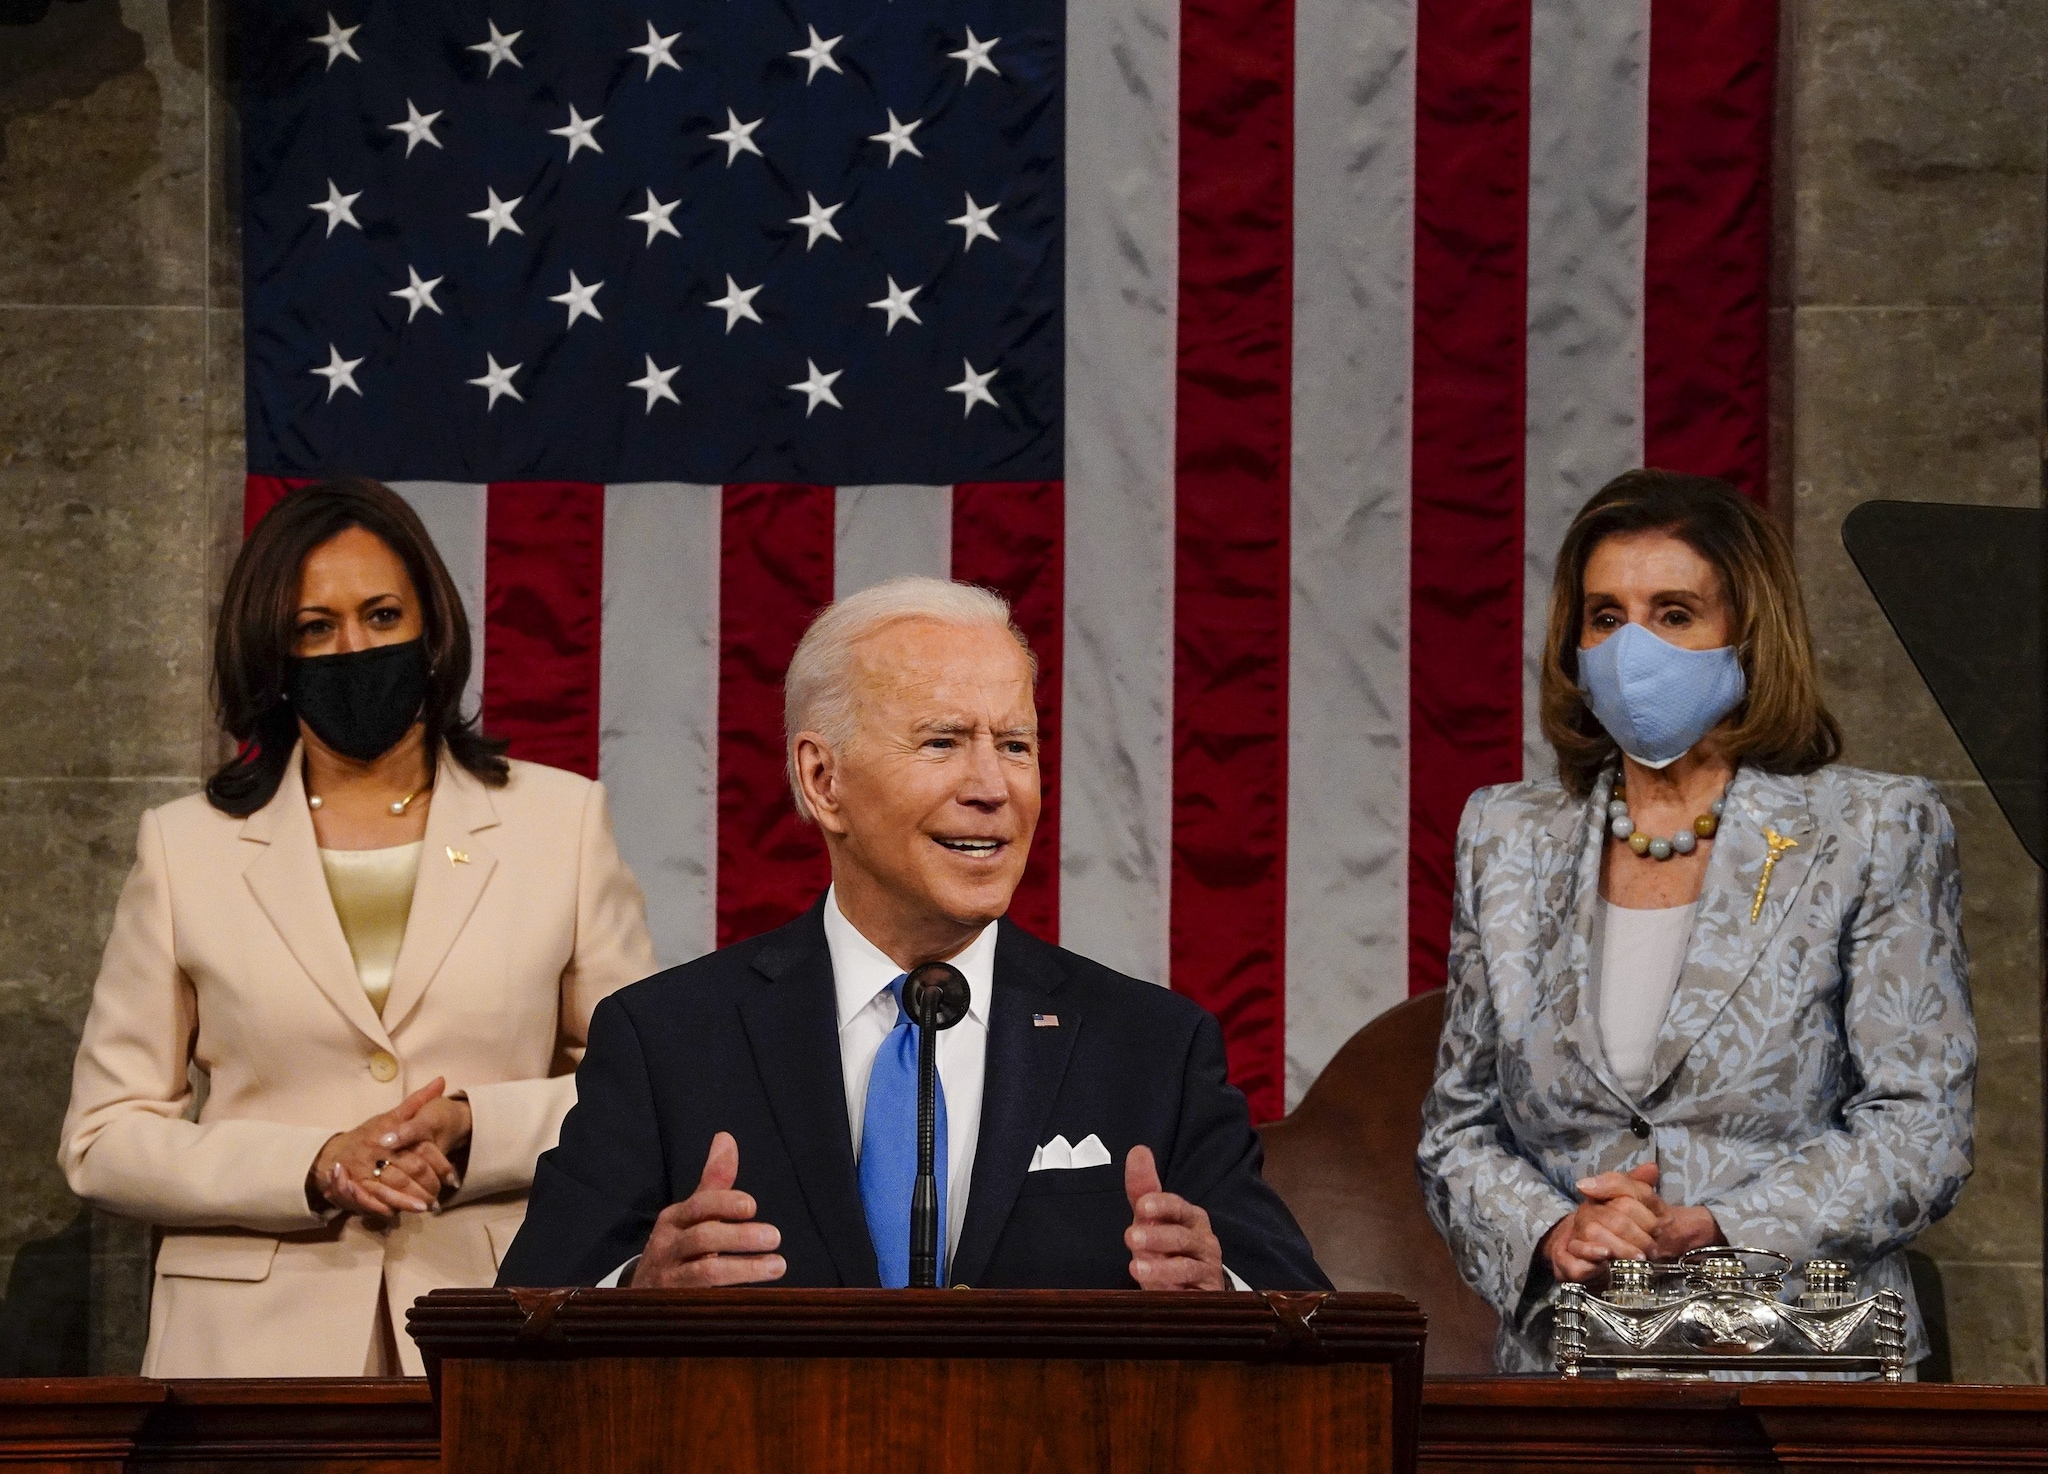 Kamala Harris, Nancy Pelosi, Joe Biden